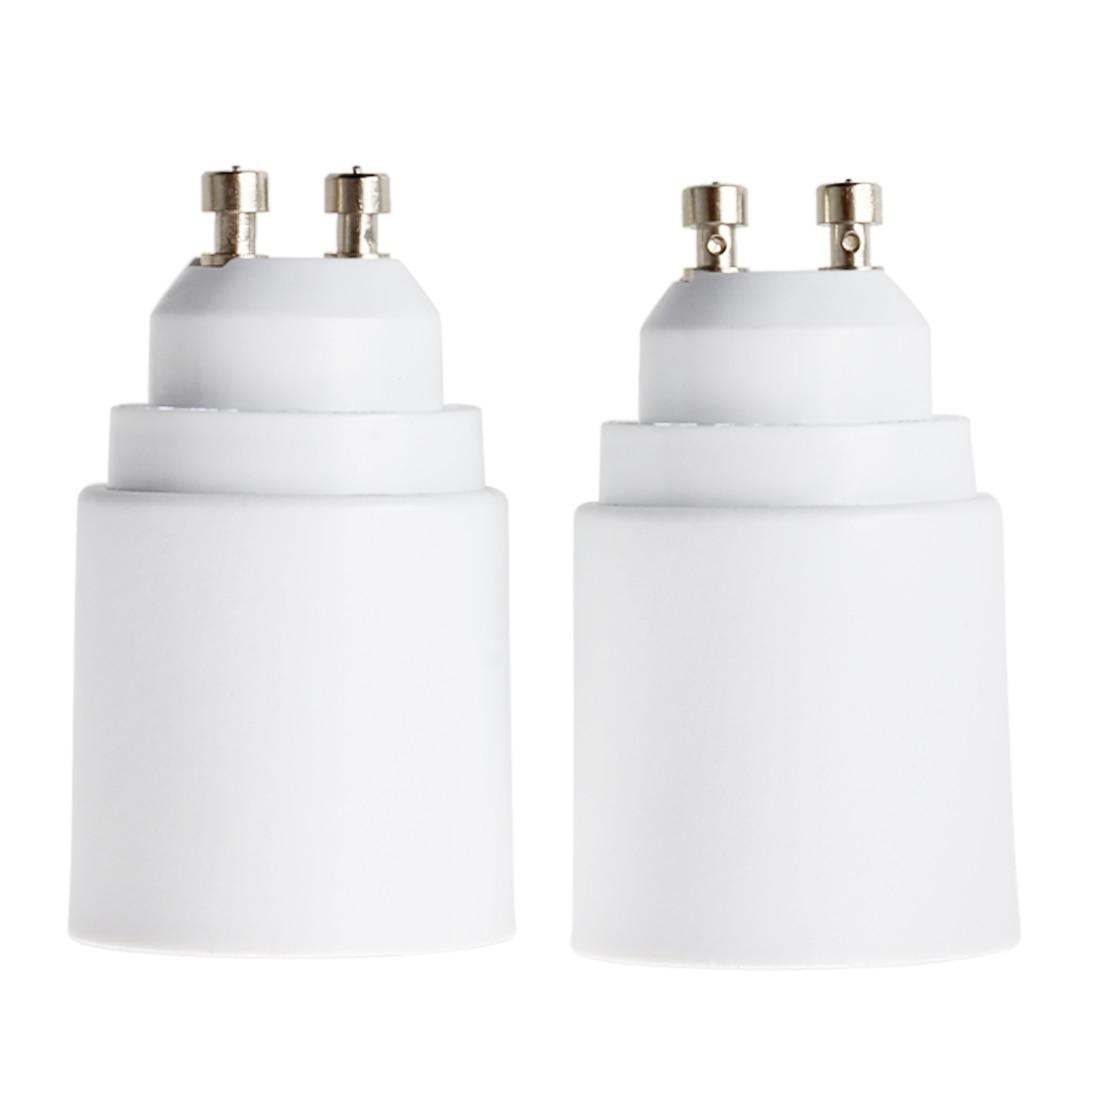 2 Packs White LED Light GU10 to E27 Plug Adapter